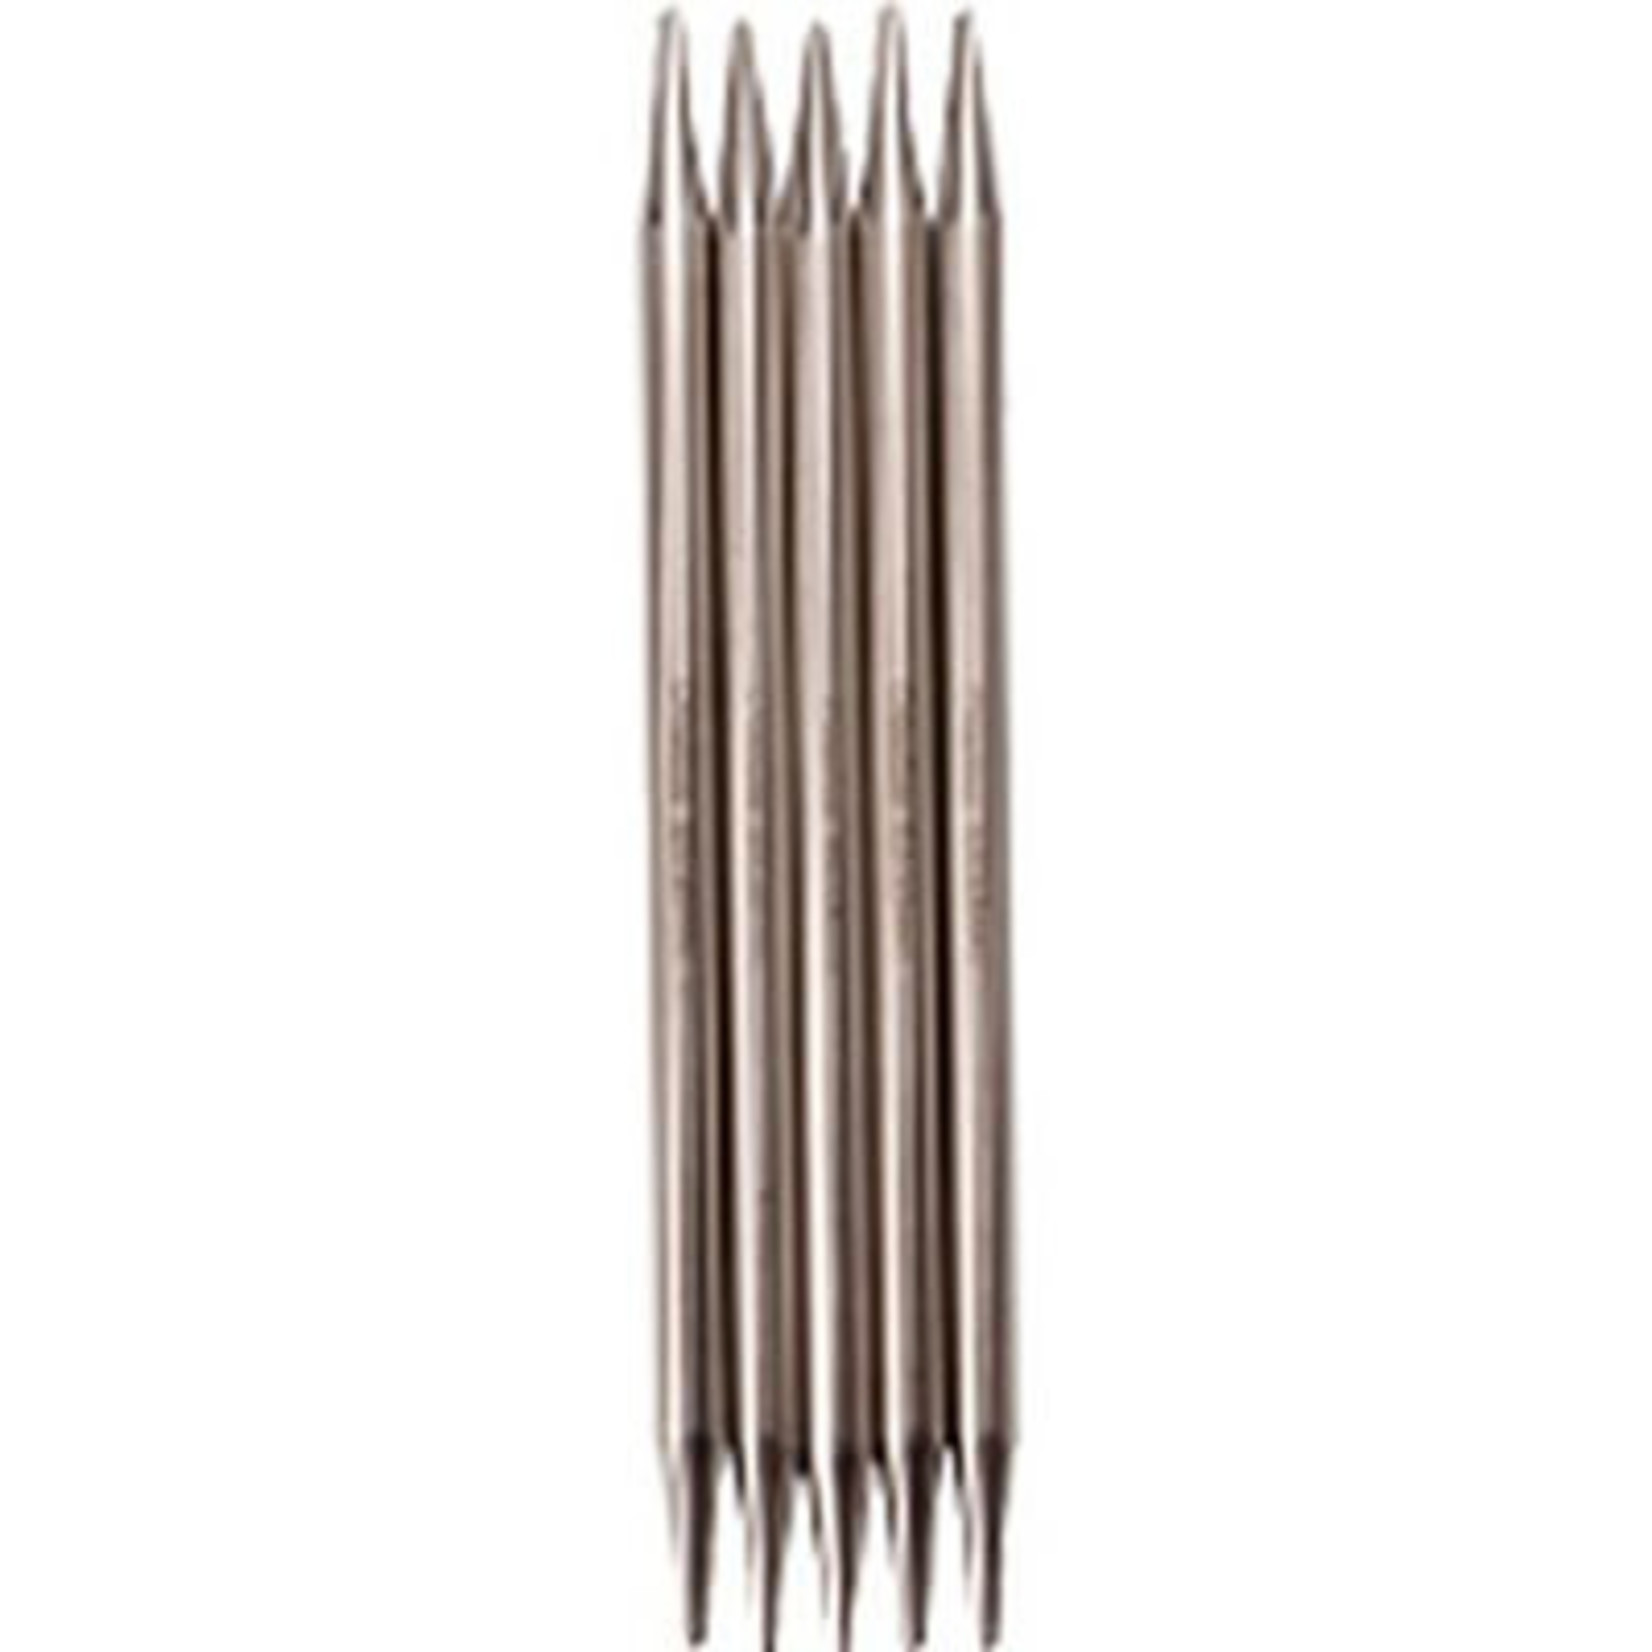 "ChiaoGoo ChiaoGoo Stainless Steel 8"" DPN"